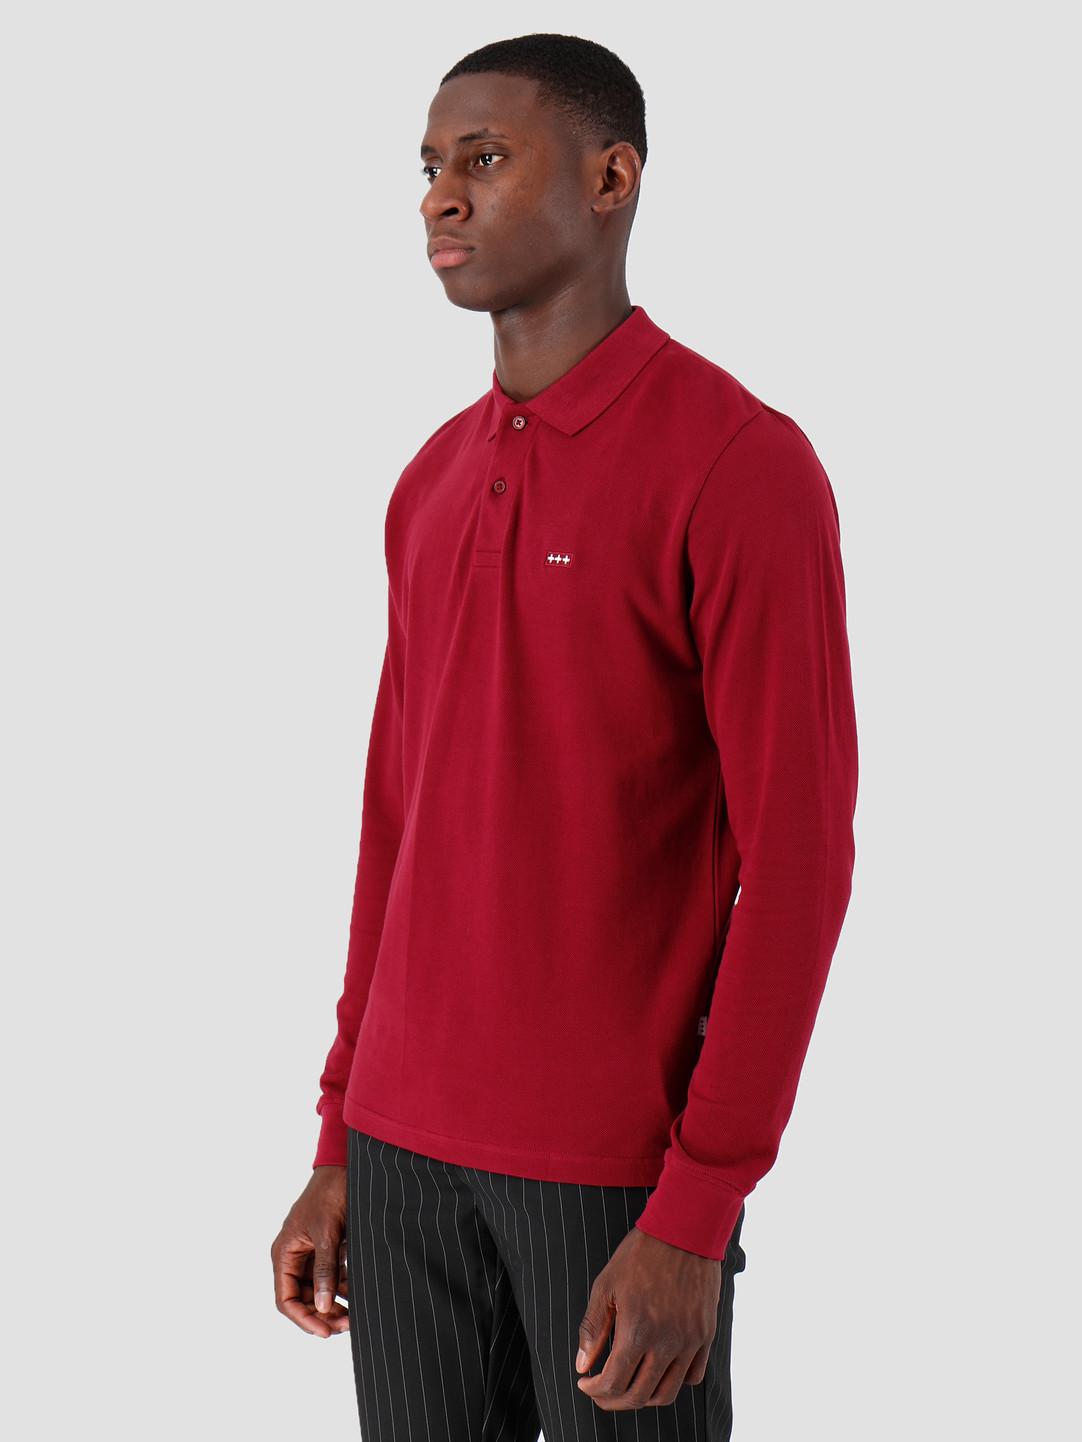 Quality Blanks Quality Blanks QB51 Longsleeve Polo Burgundy Red